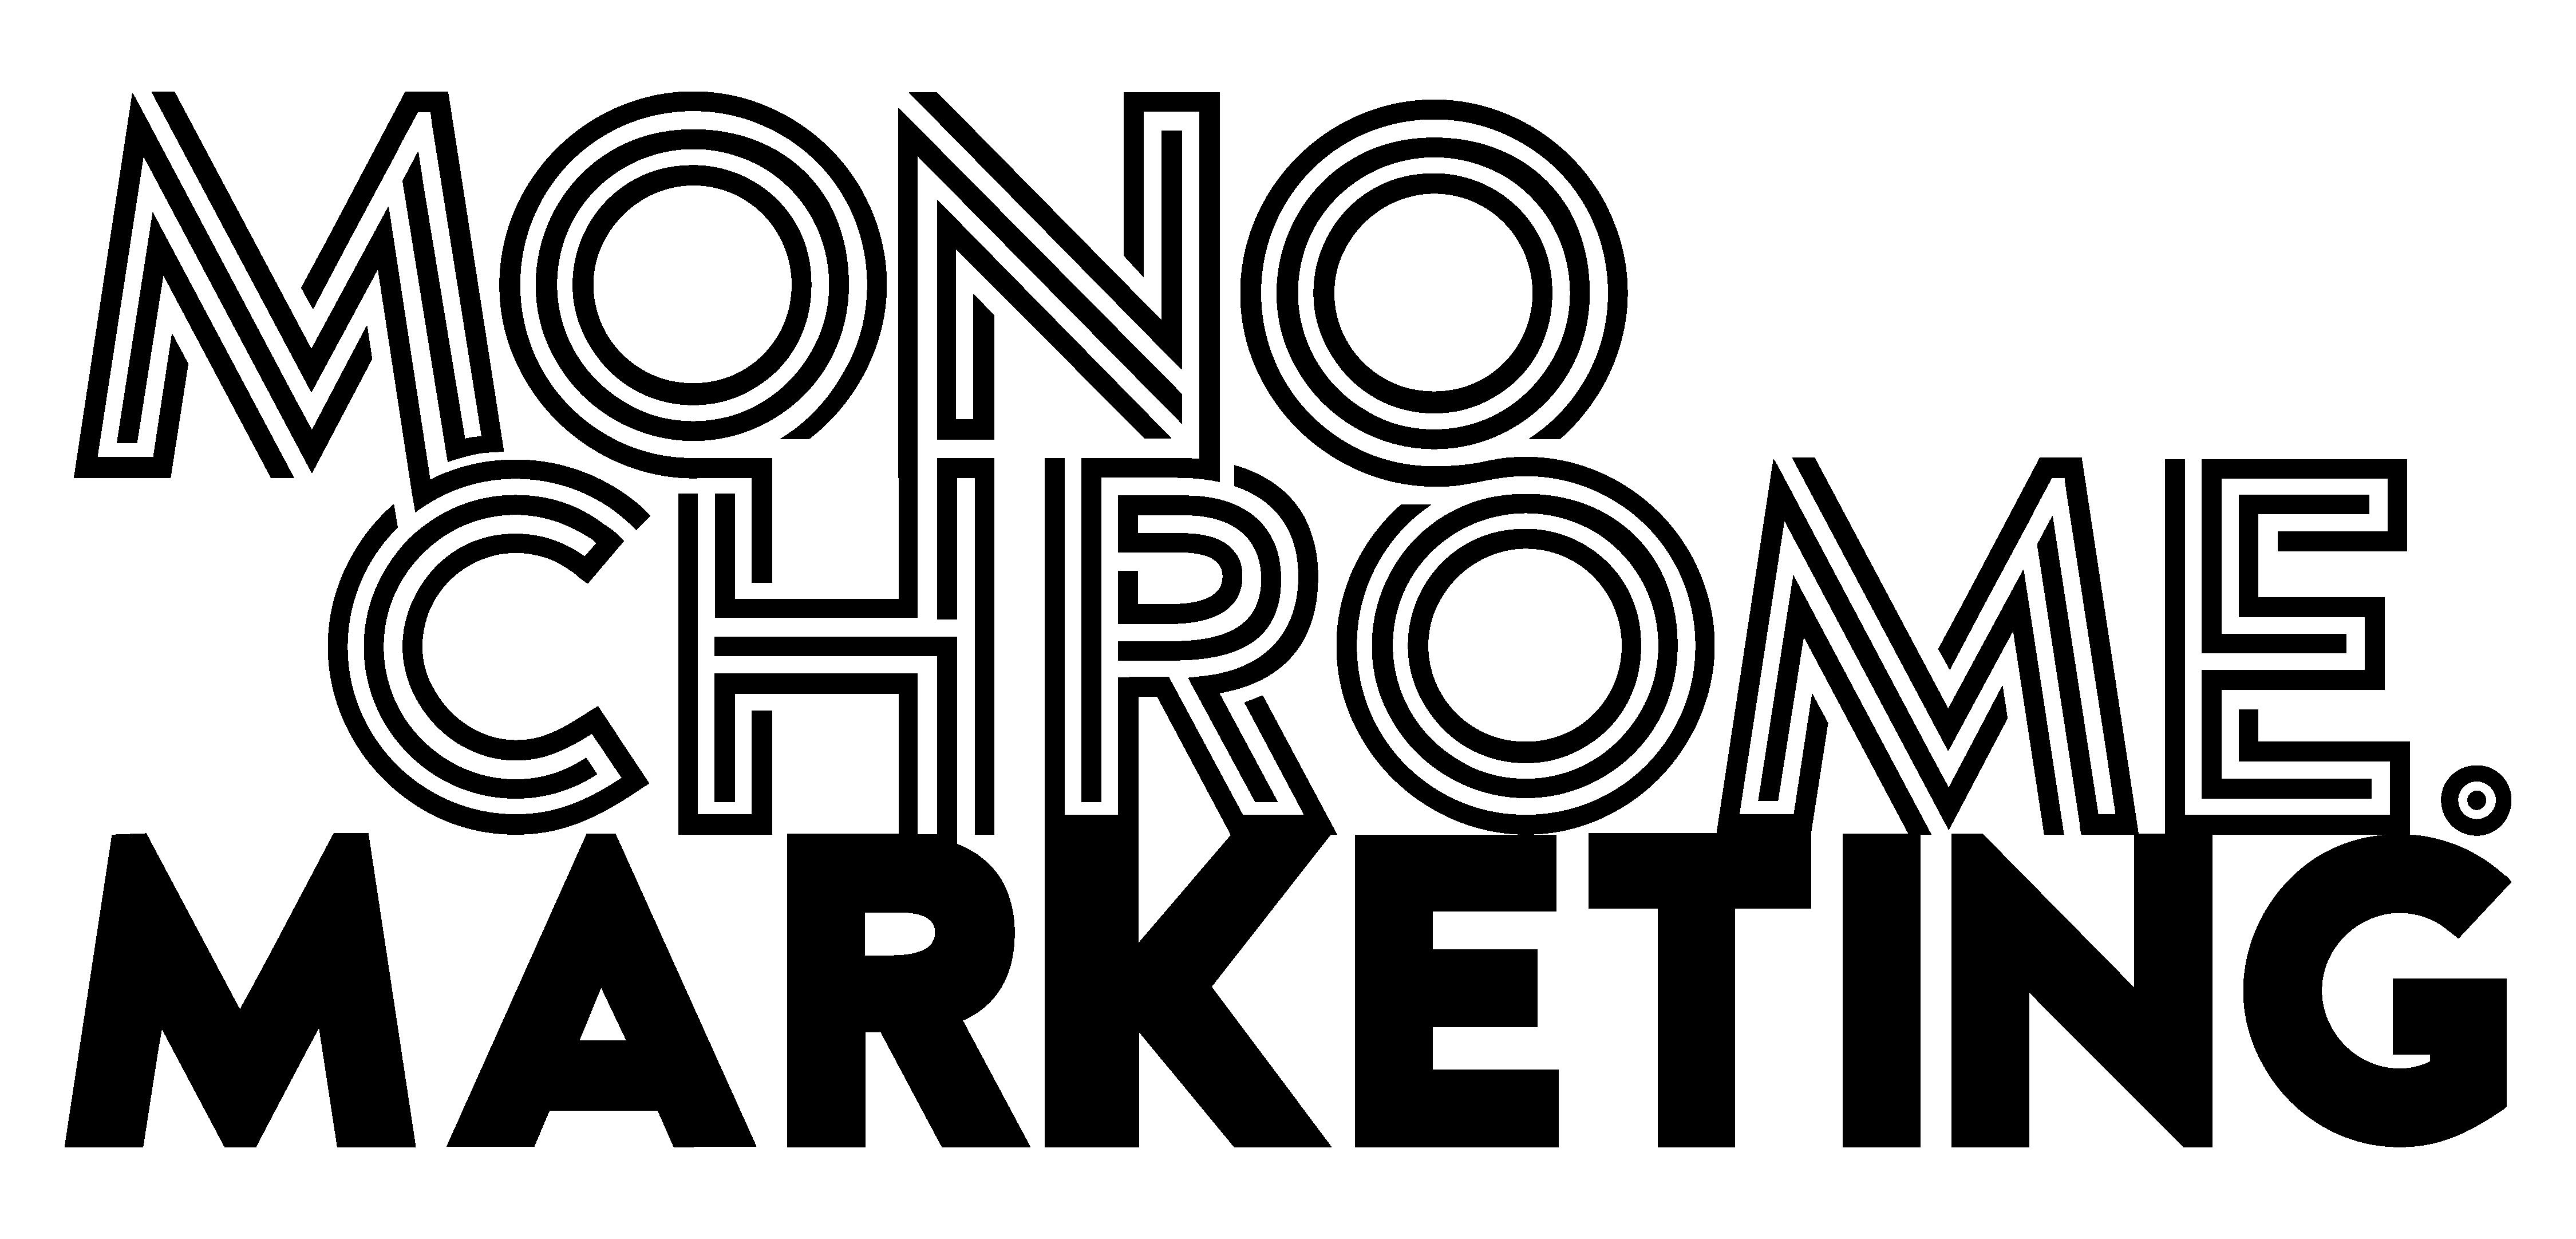 Monochrome Marketing Logo